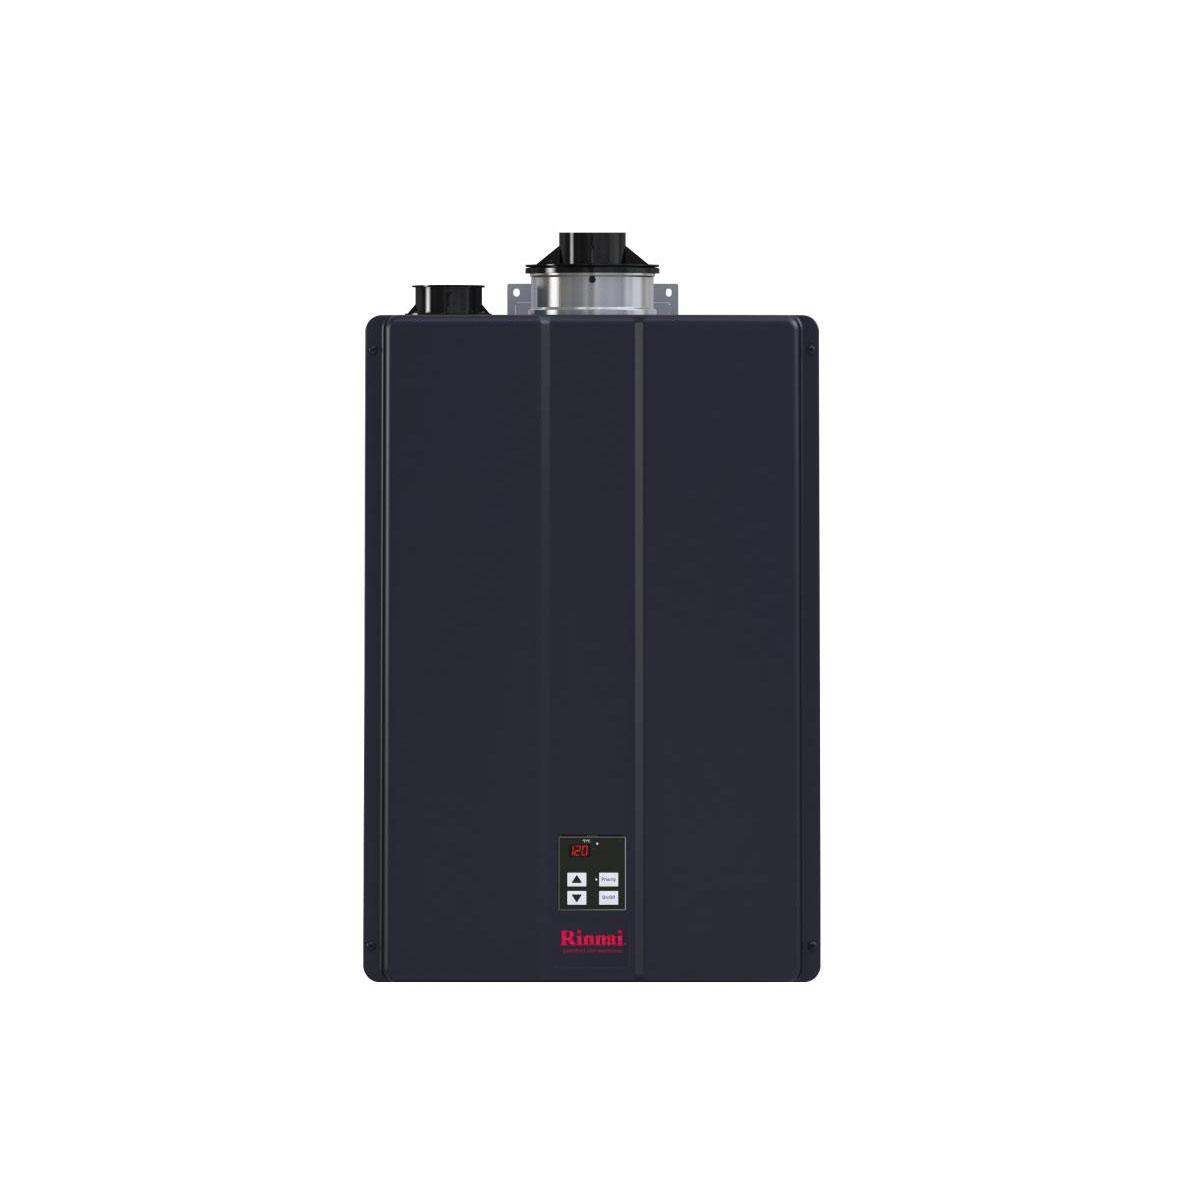 Rinnai® SENSEI™ CU199iN SE+ Super High Efficiency Tankless Water Heater, Natural Gas Fuel, 199000 Btu/hr, Indoor, Condensing, 11 gpm, 0.97, Commercial